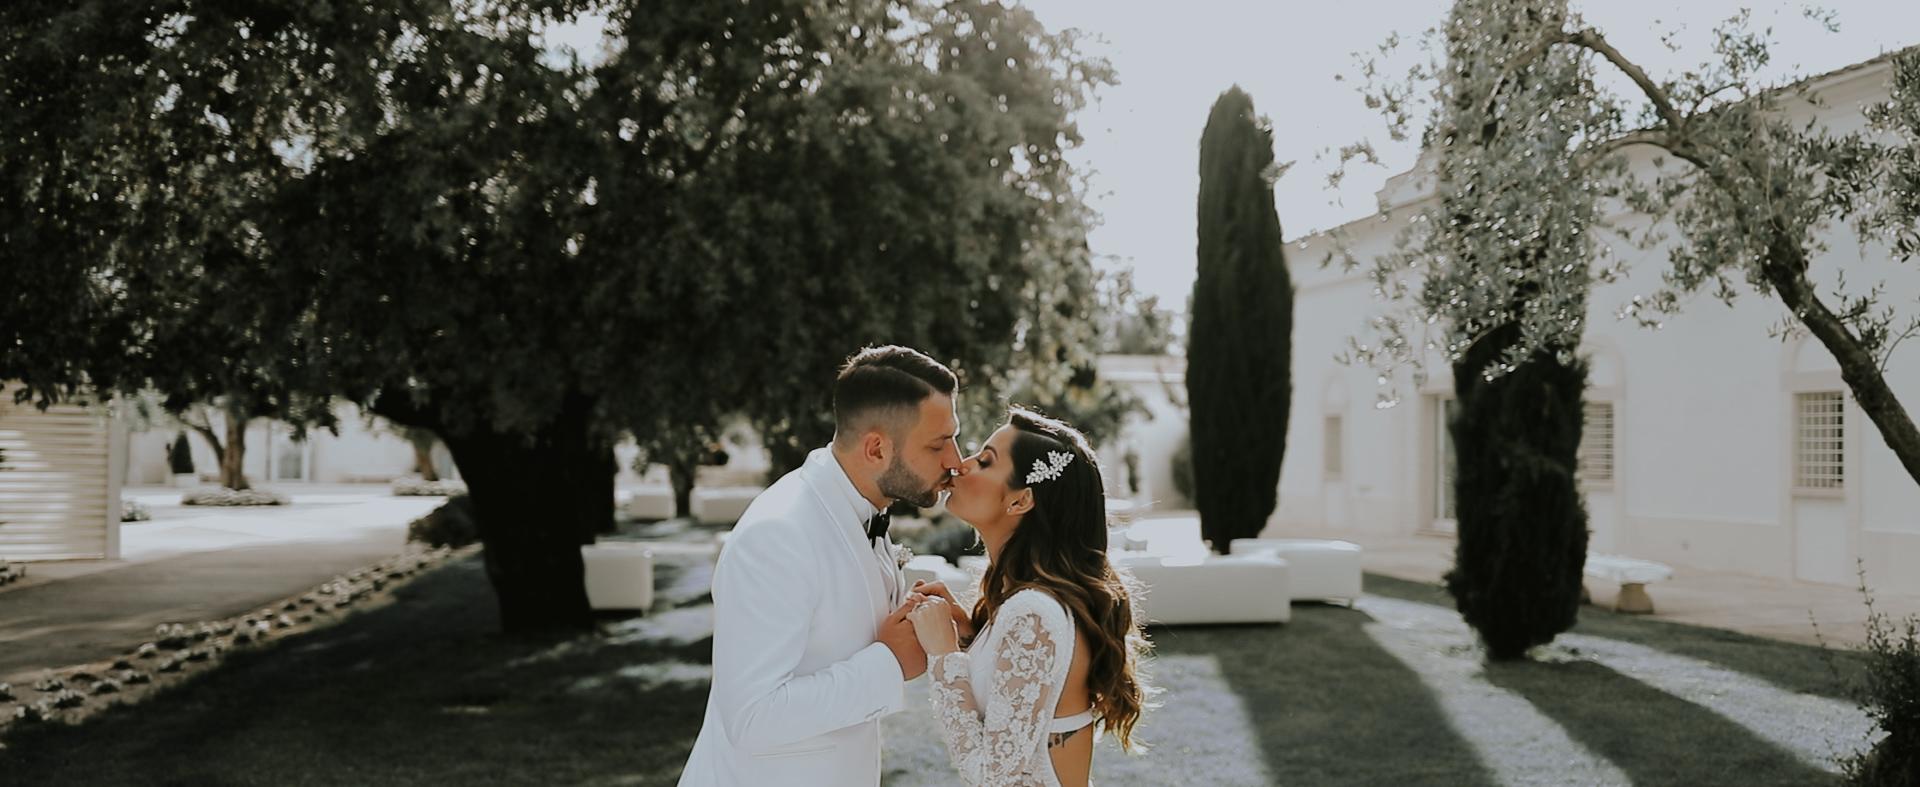 federico-cardone-alessia-macari-video-matrimonio-videografo-2 Matrimonio Alessia Macari e Oliver Kragl